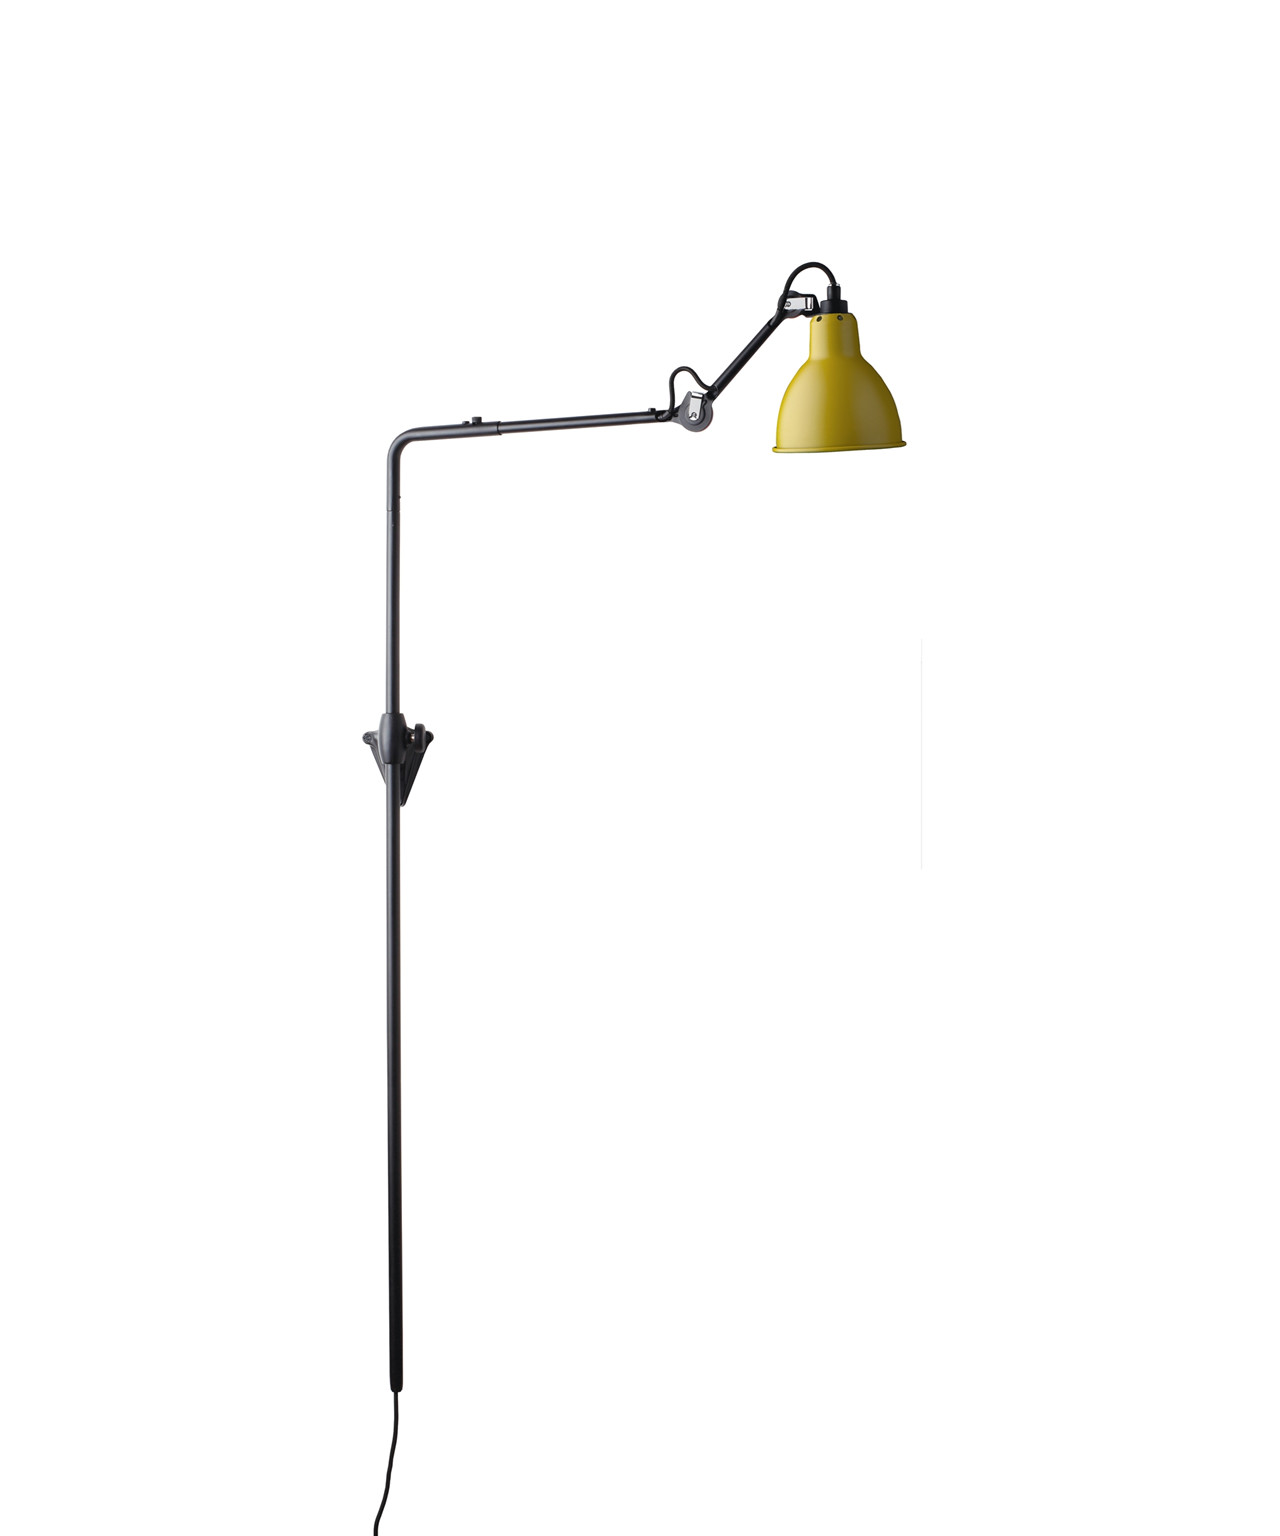 216 wandleuchte gelb lampe gras. Black Bedroom Furniture Sets. Home Design Ideas